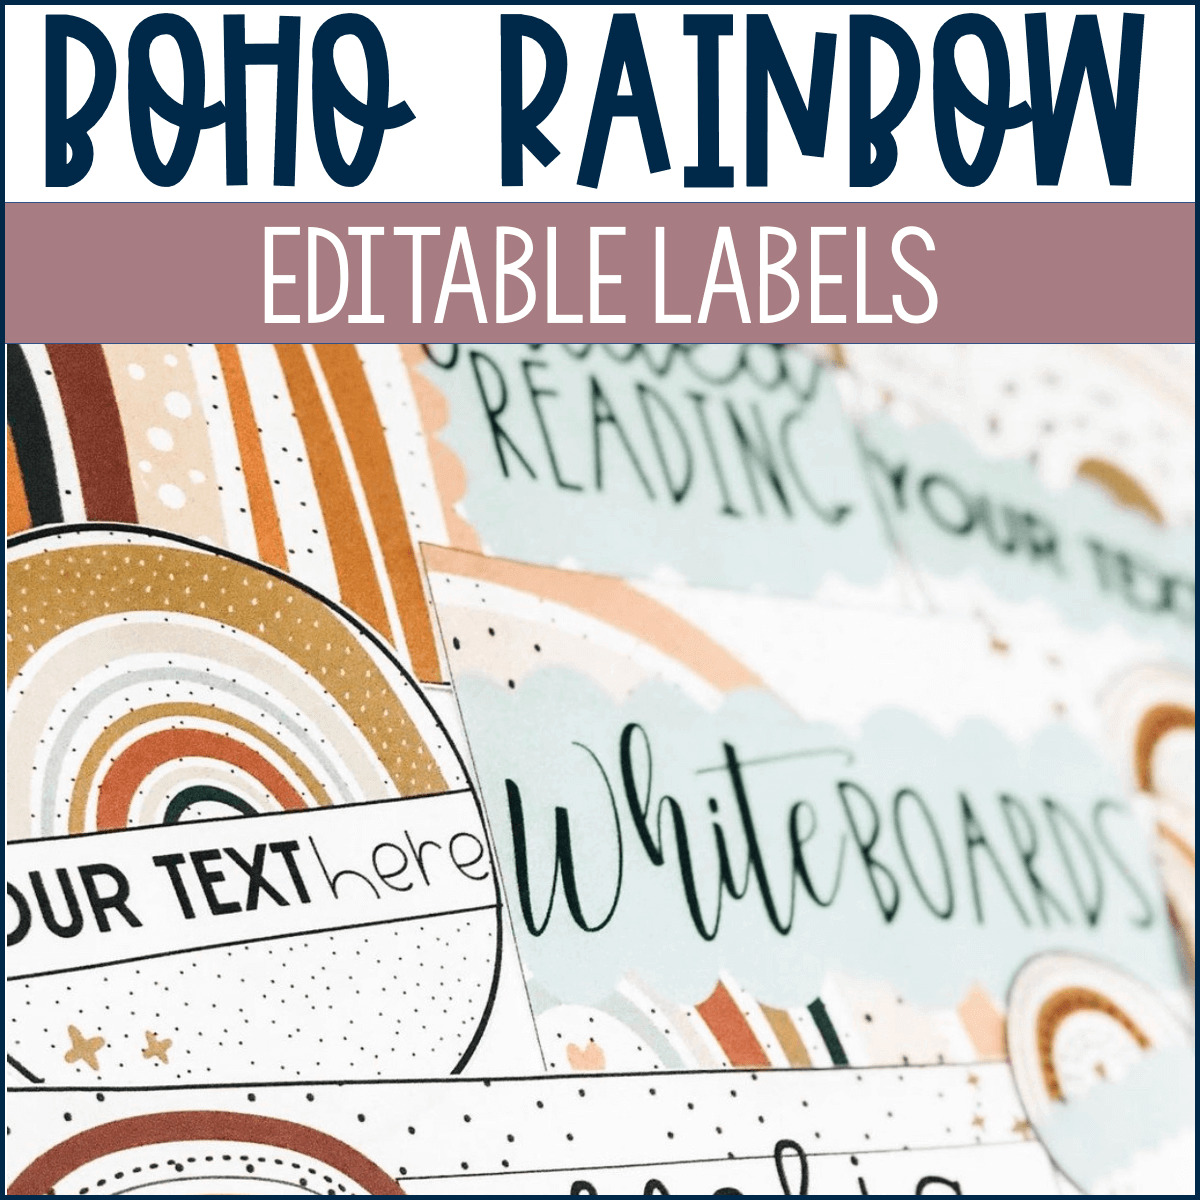 Boho Rainbow Editable Labels for easy classroom organization.